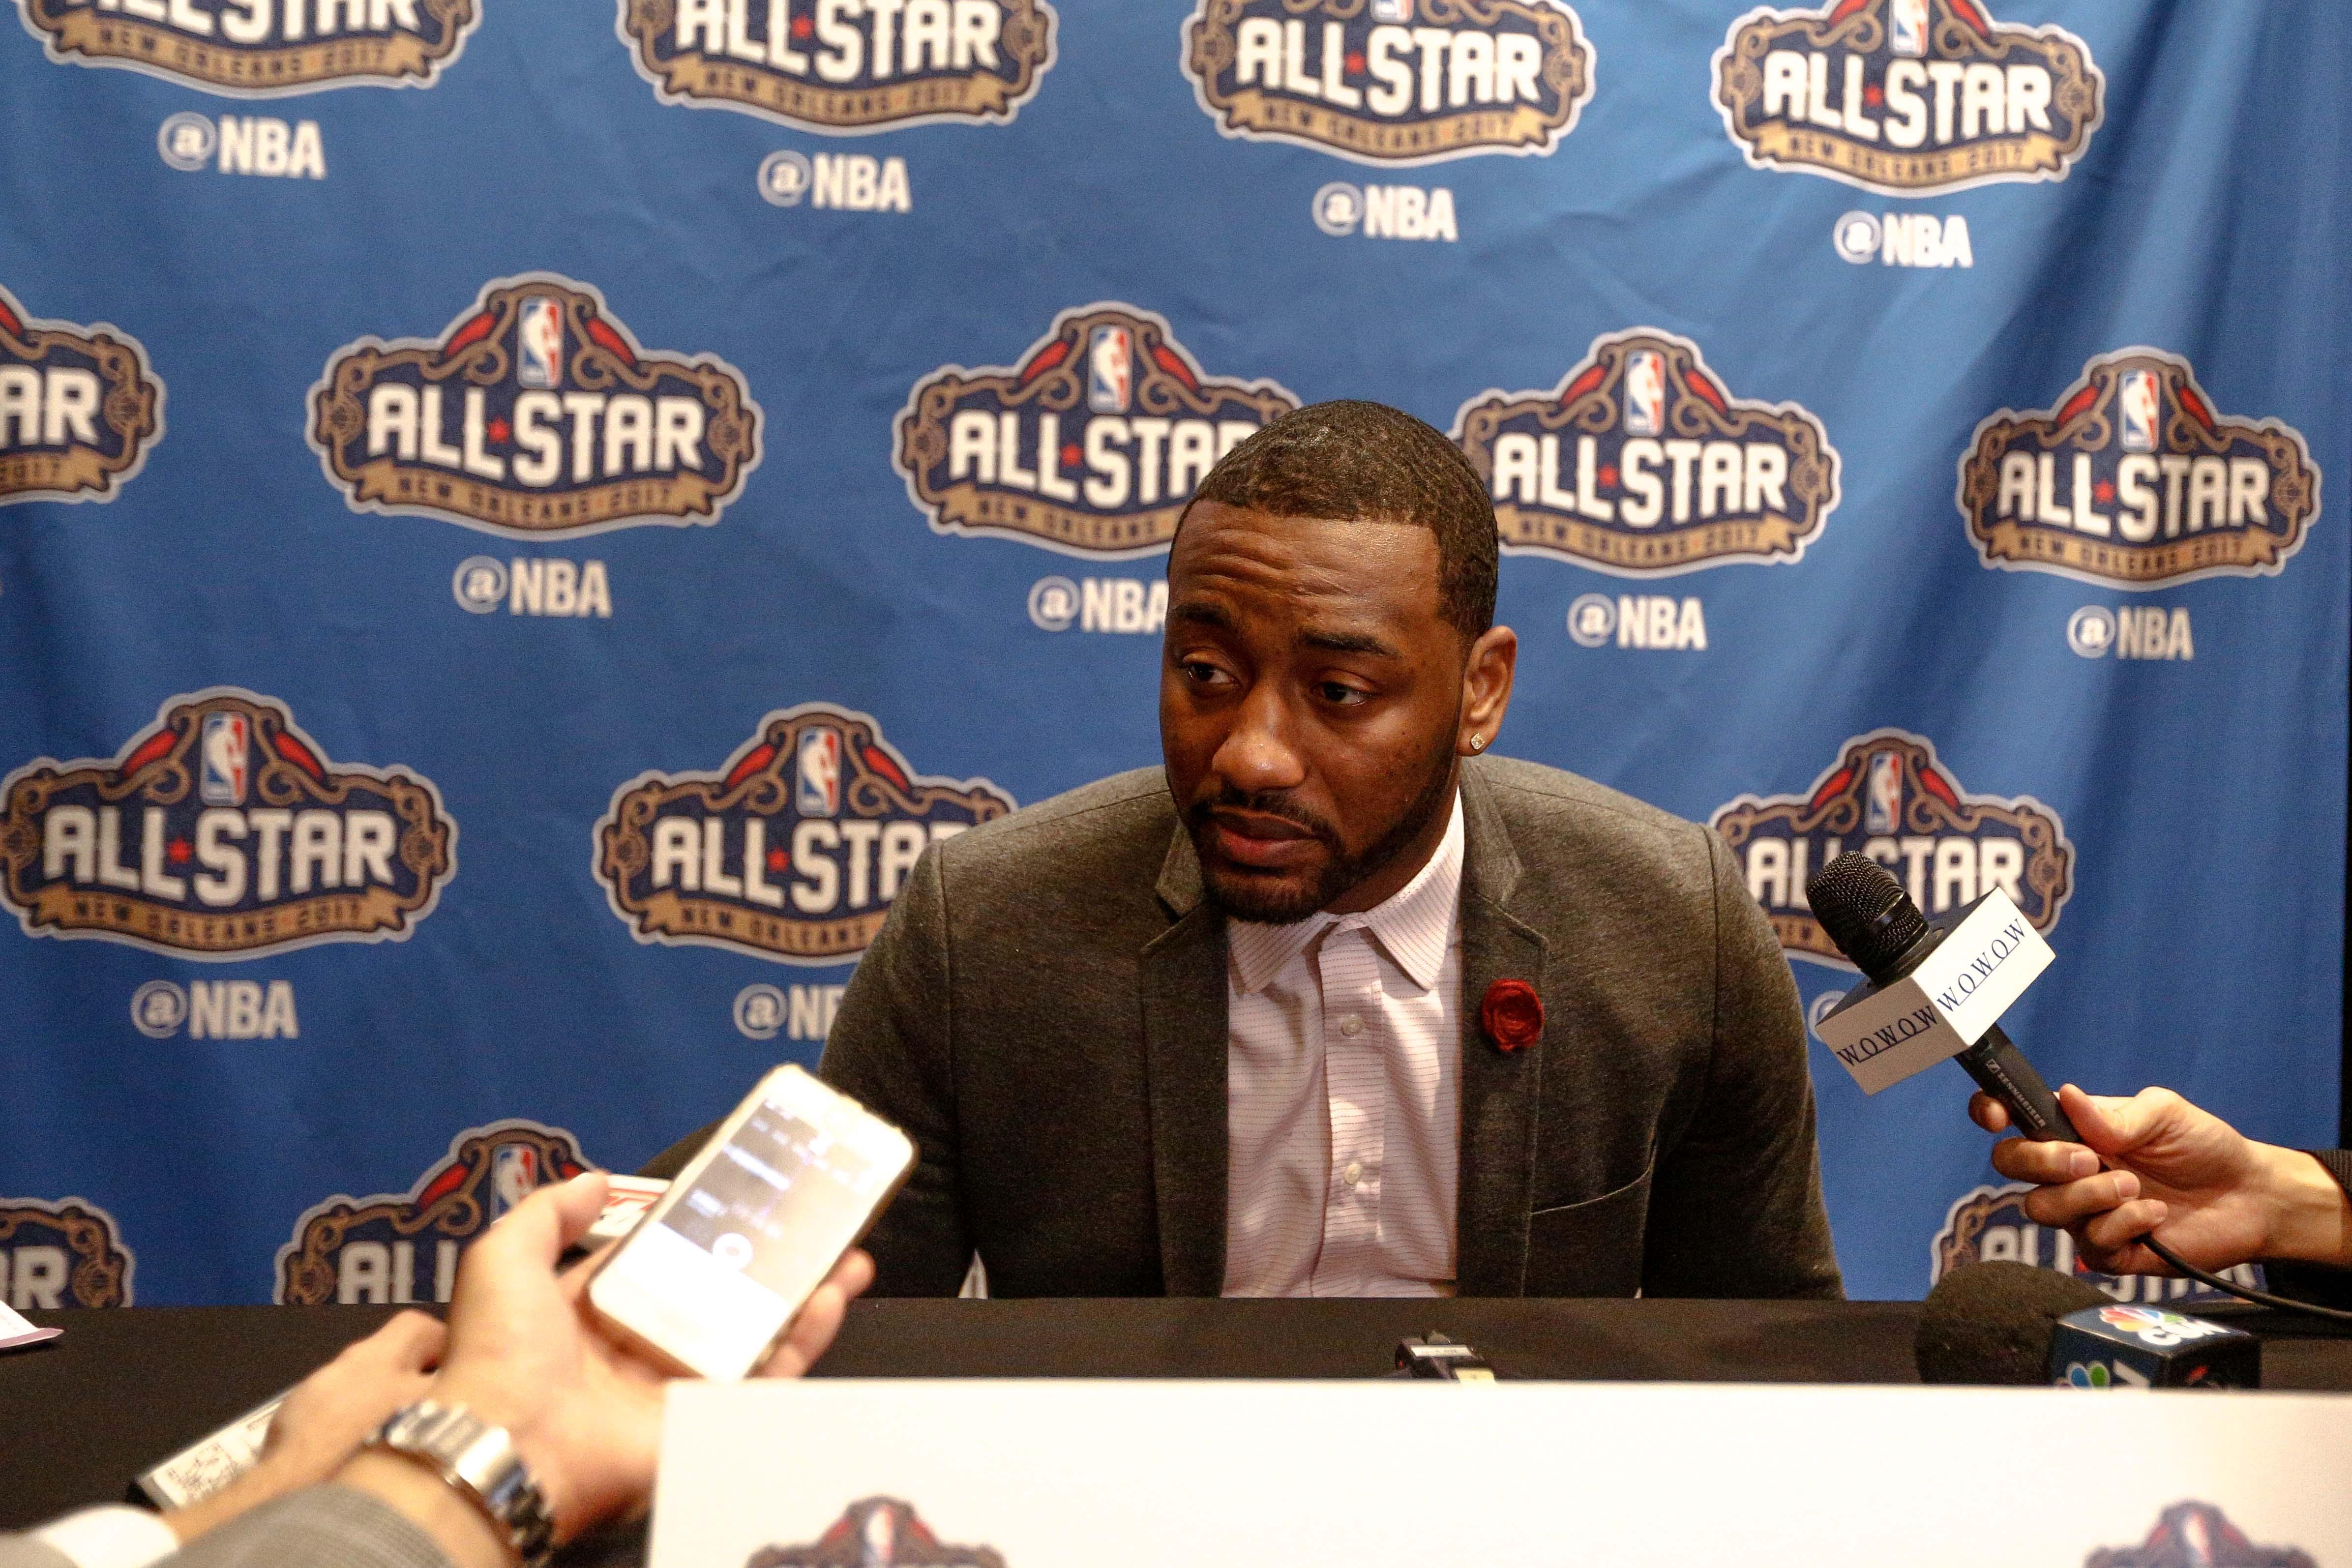 NBA: All Star Press Conference